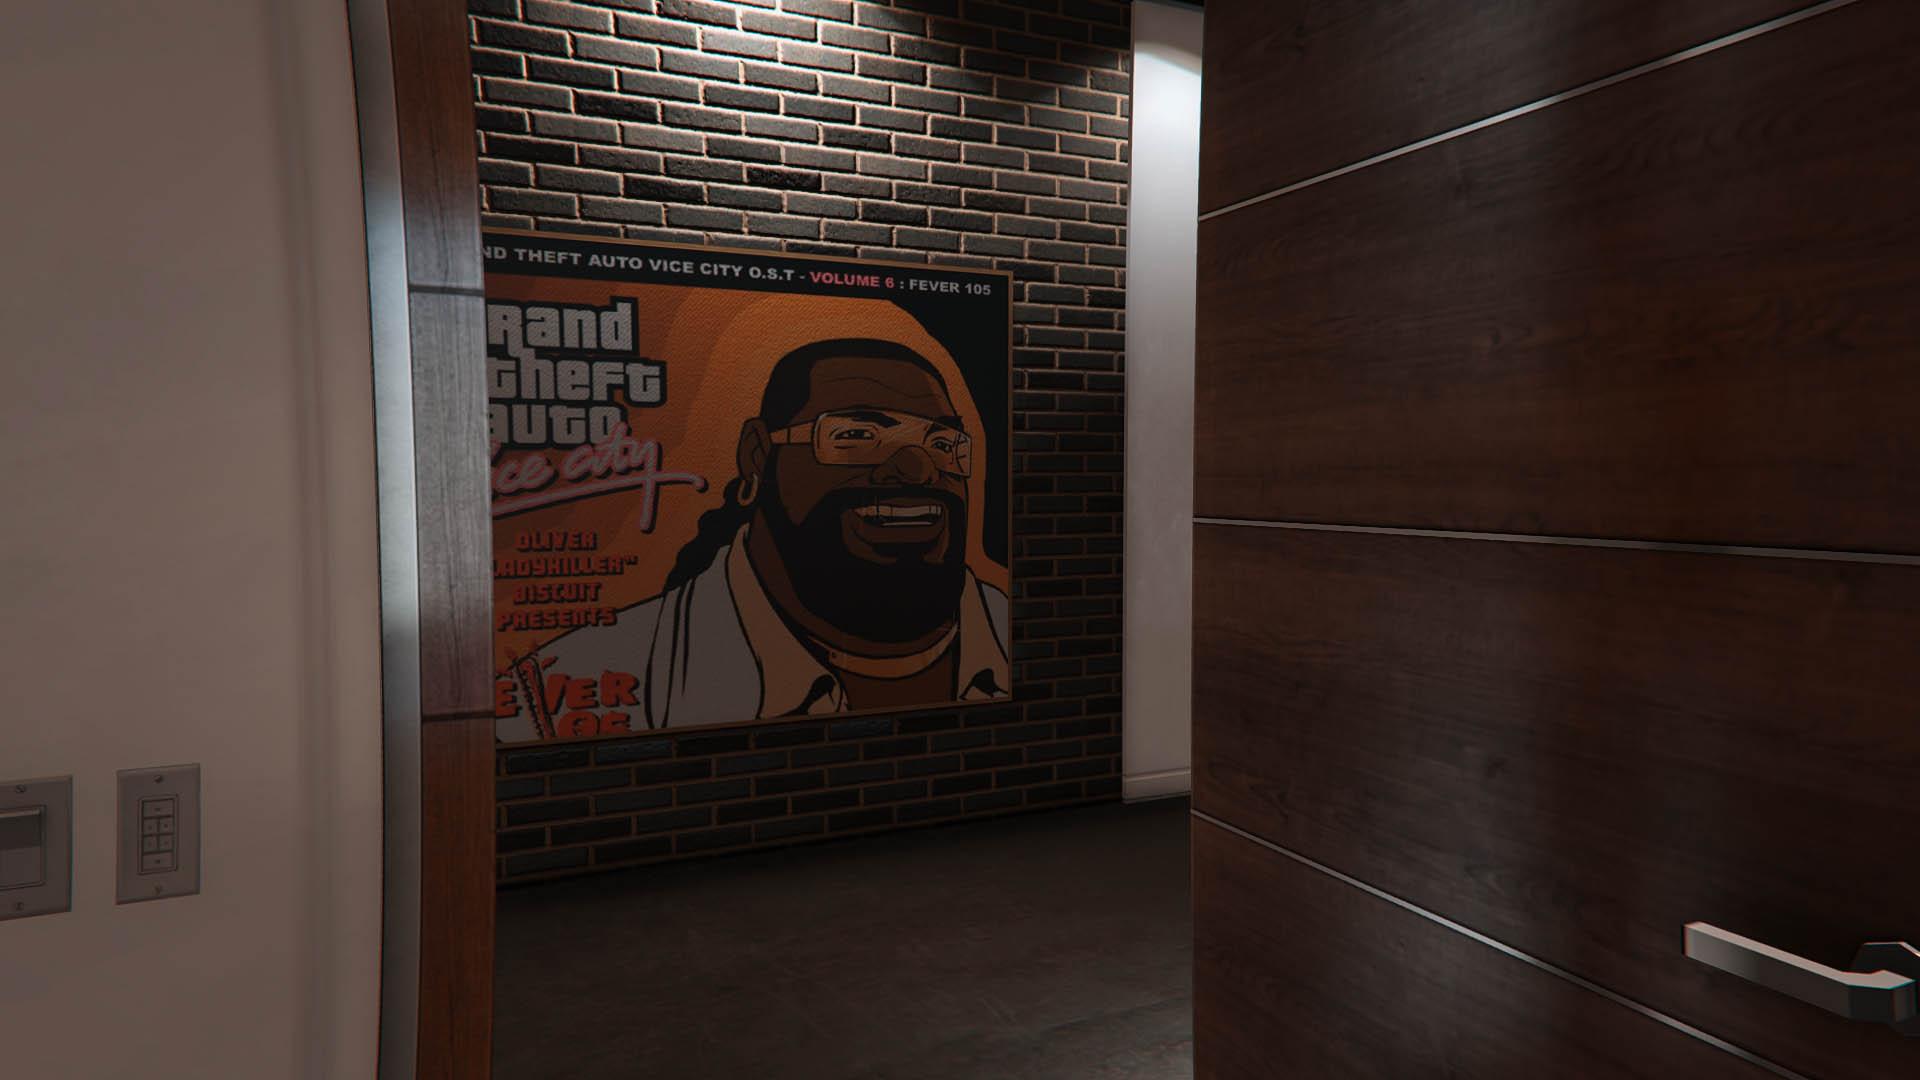 2016 Lancer Evolution >> GTA Vice City posters for Franklin's house - GTA5-Mods.com